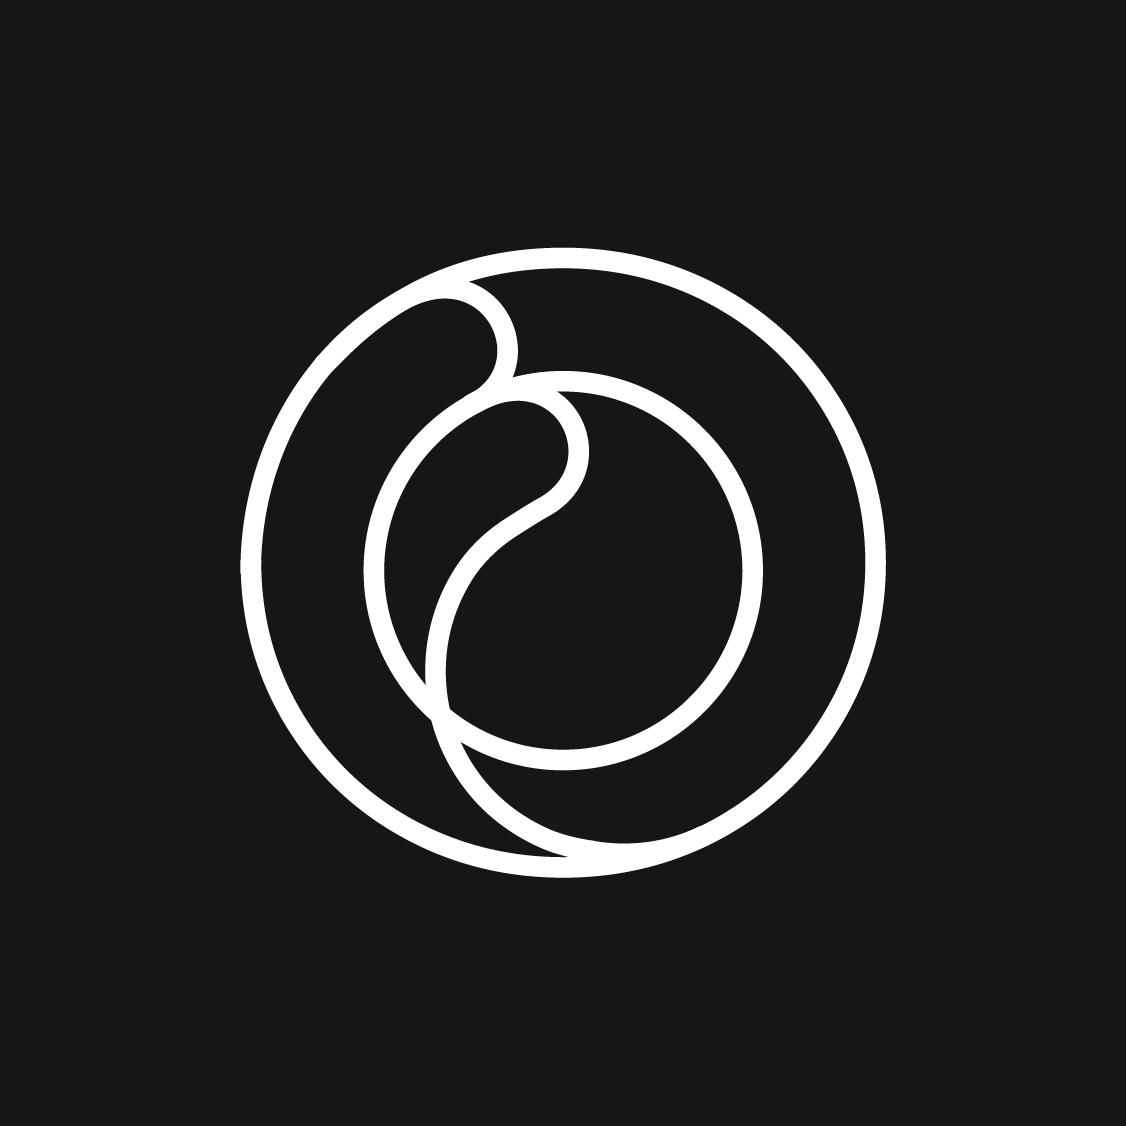 all-logos-2020-88